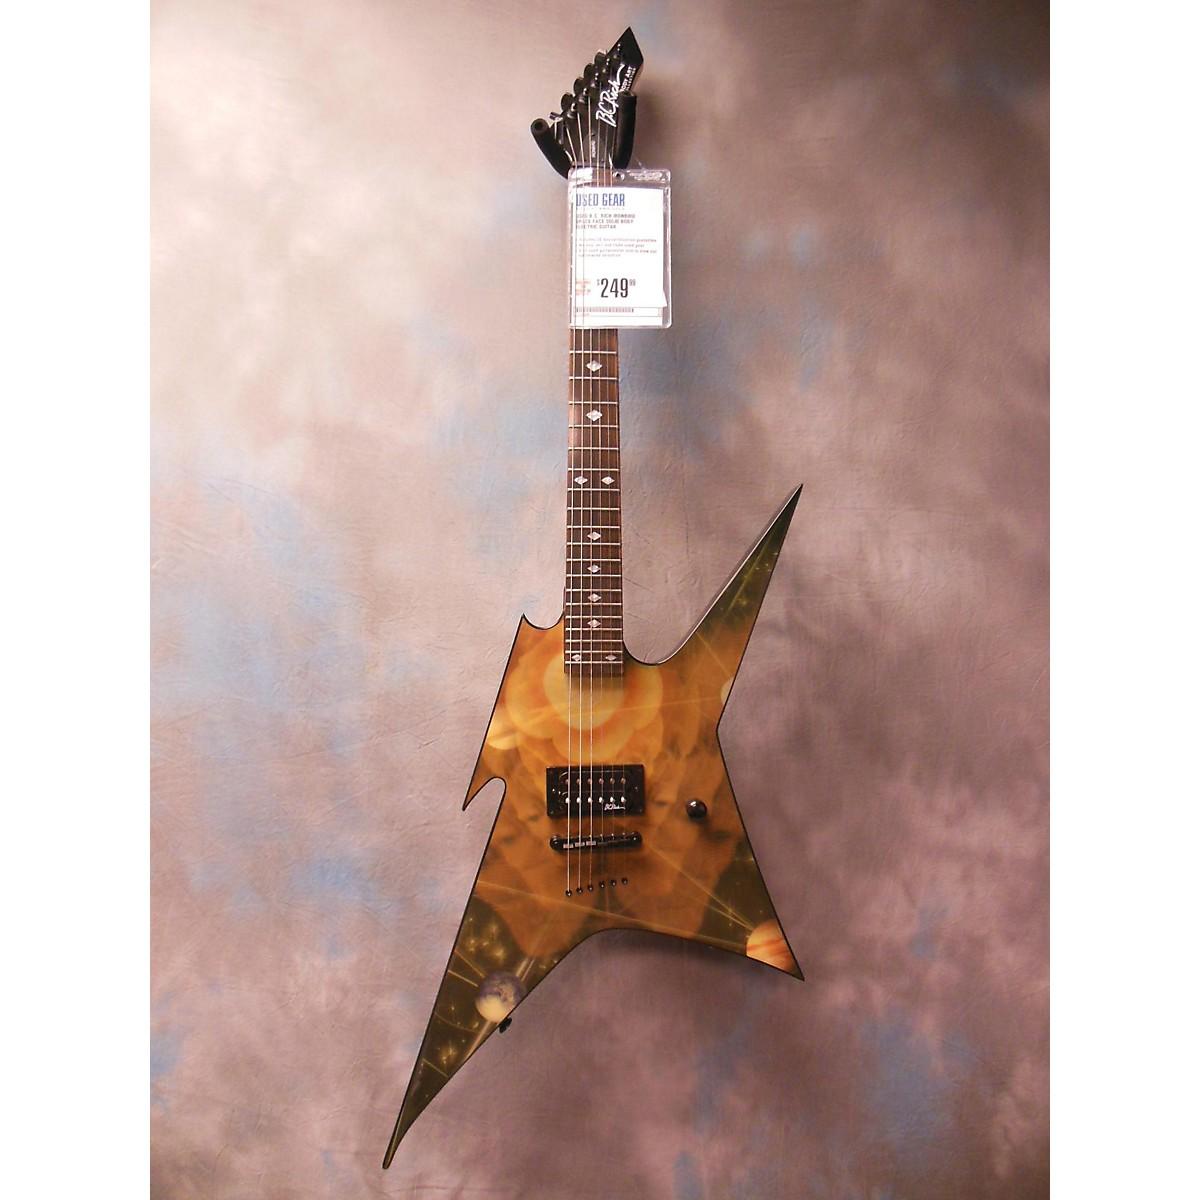 Ironbird Space Face Solid Body Electric Guitar | Guitar Center